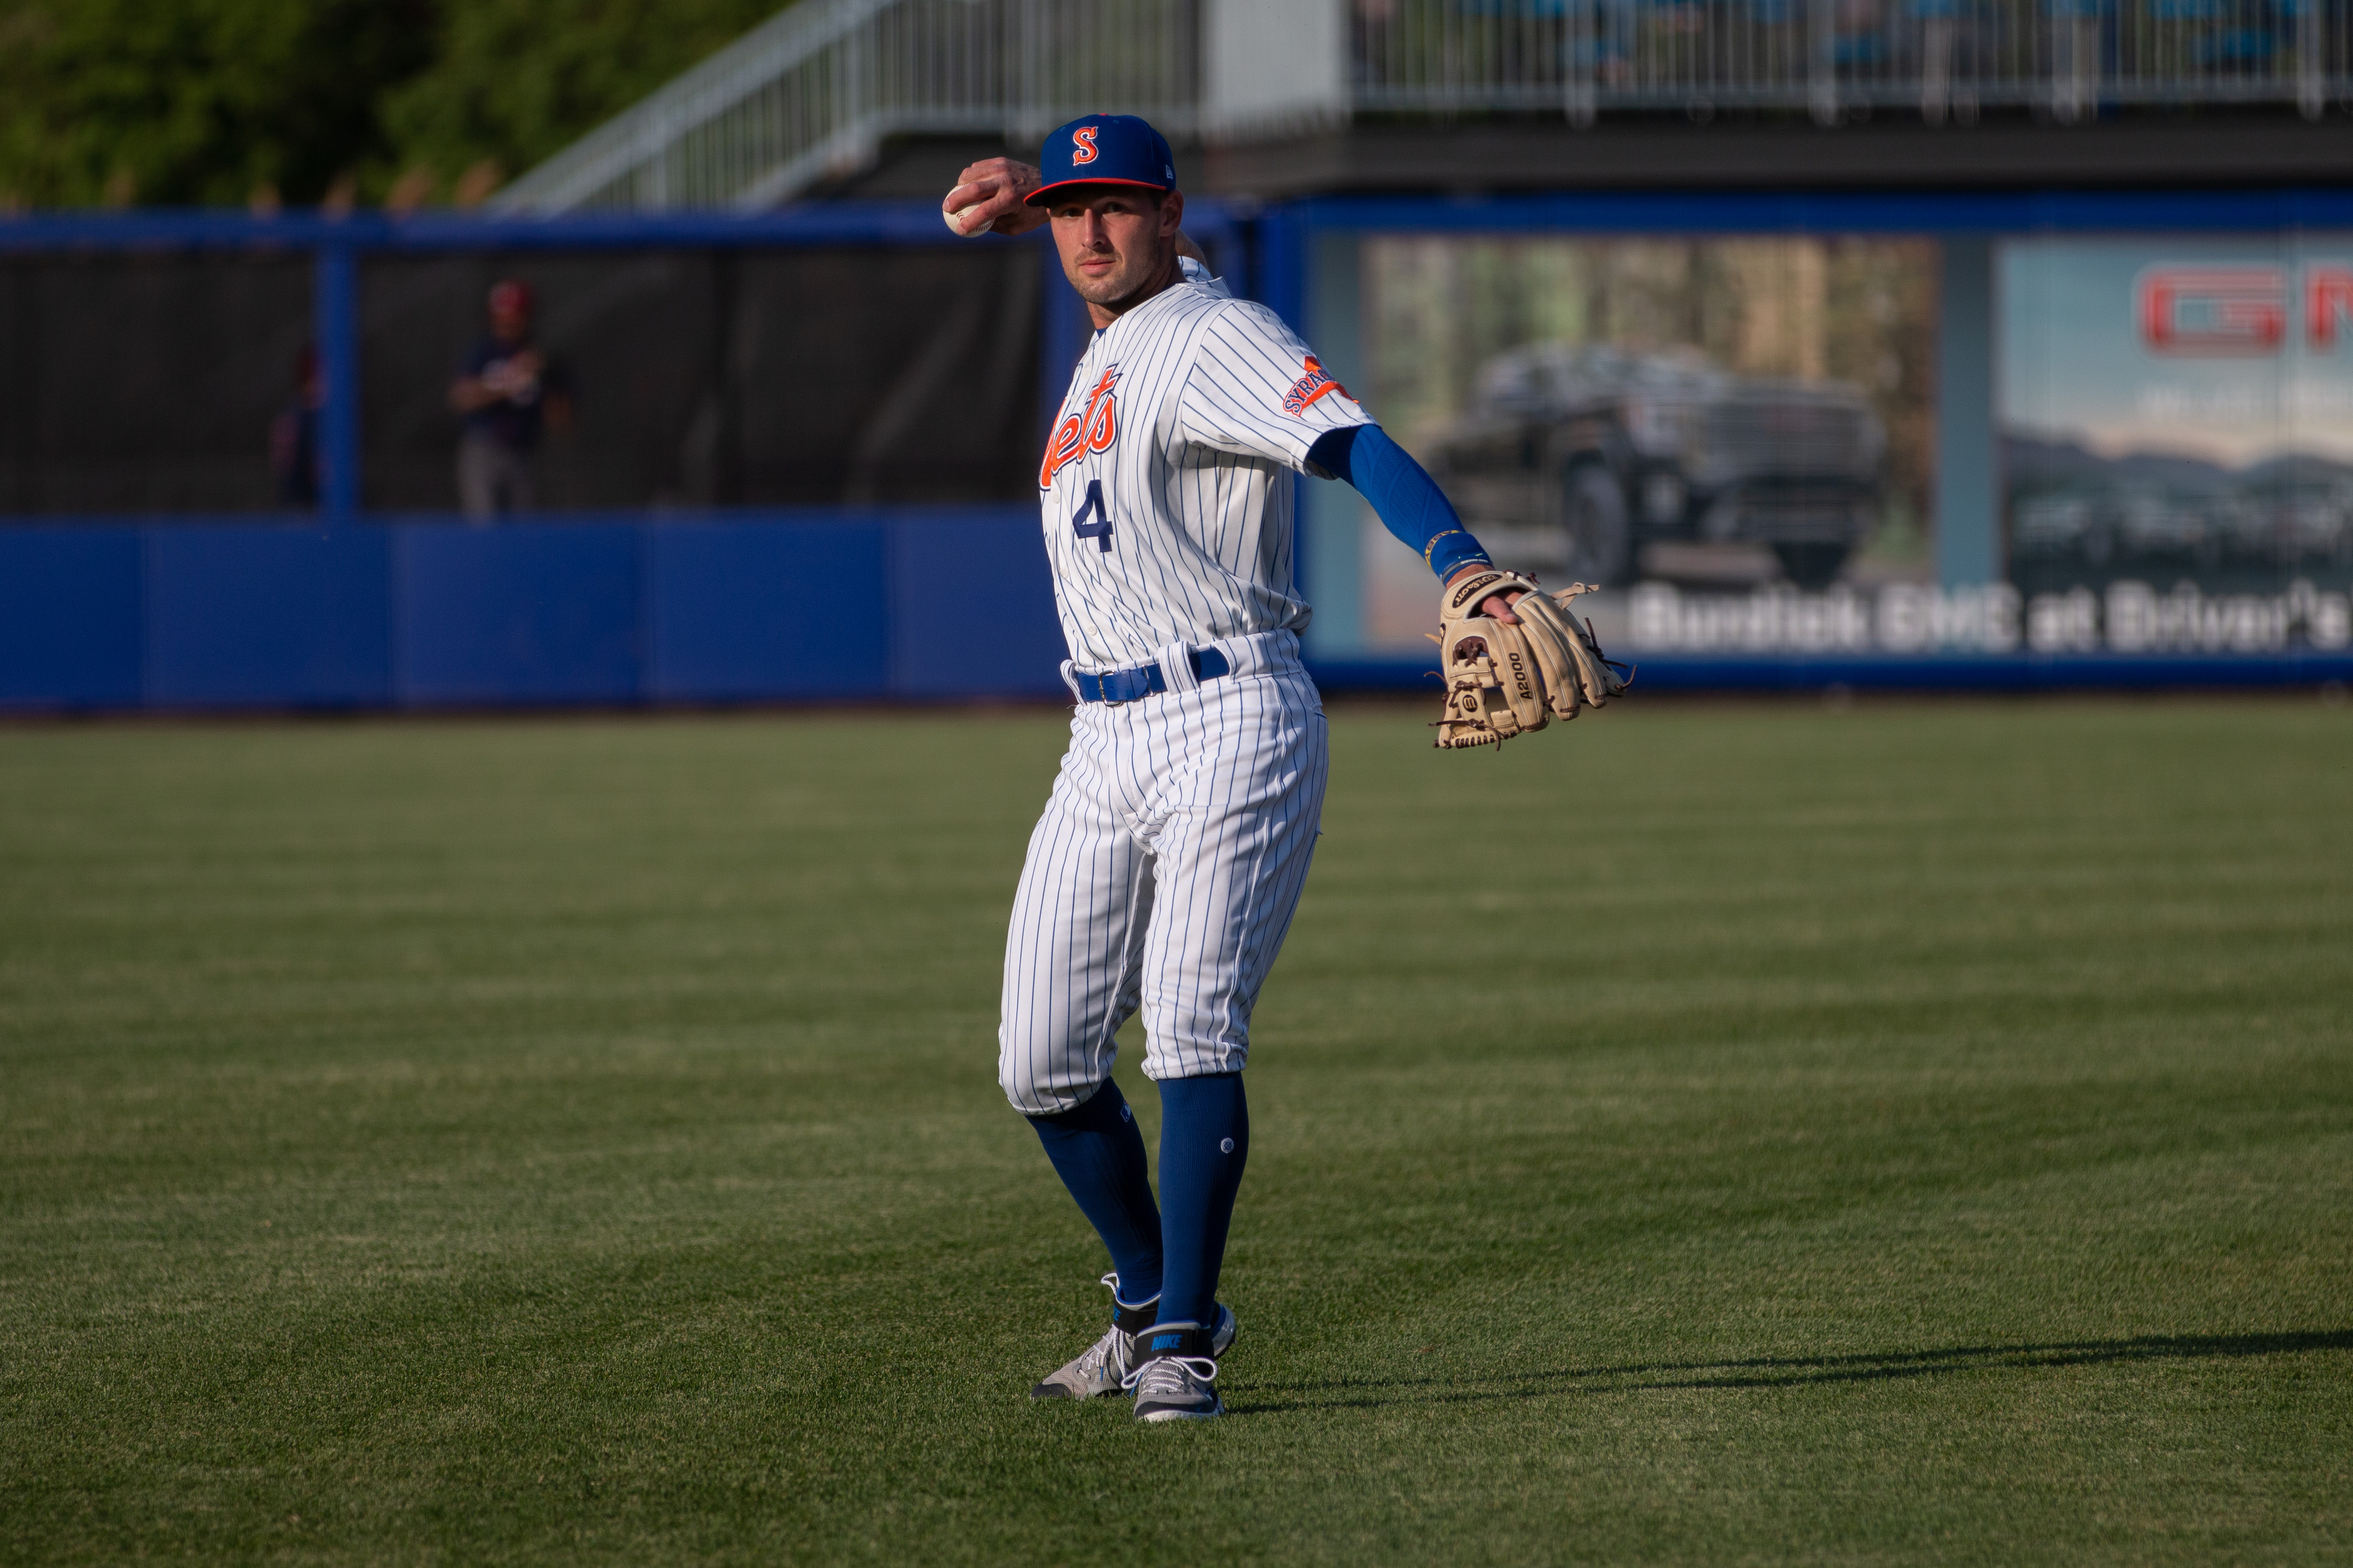 Cody Bohanek before a Syracus Mets game on May 20, 2021.